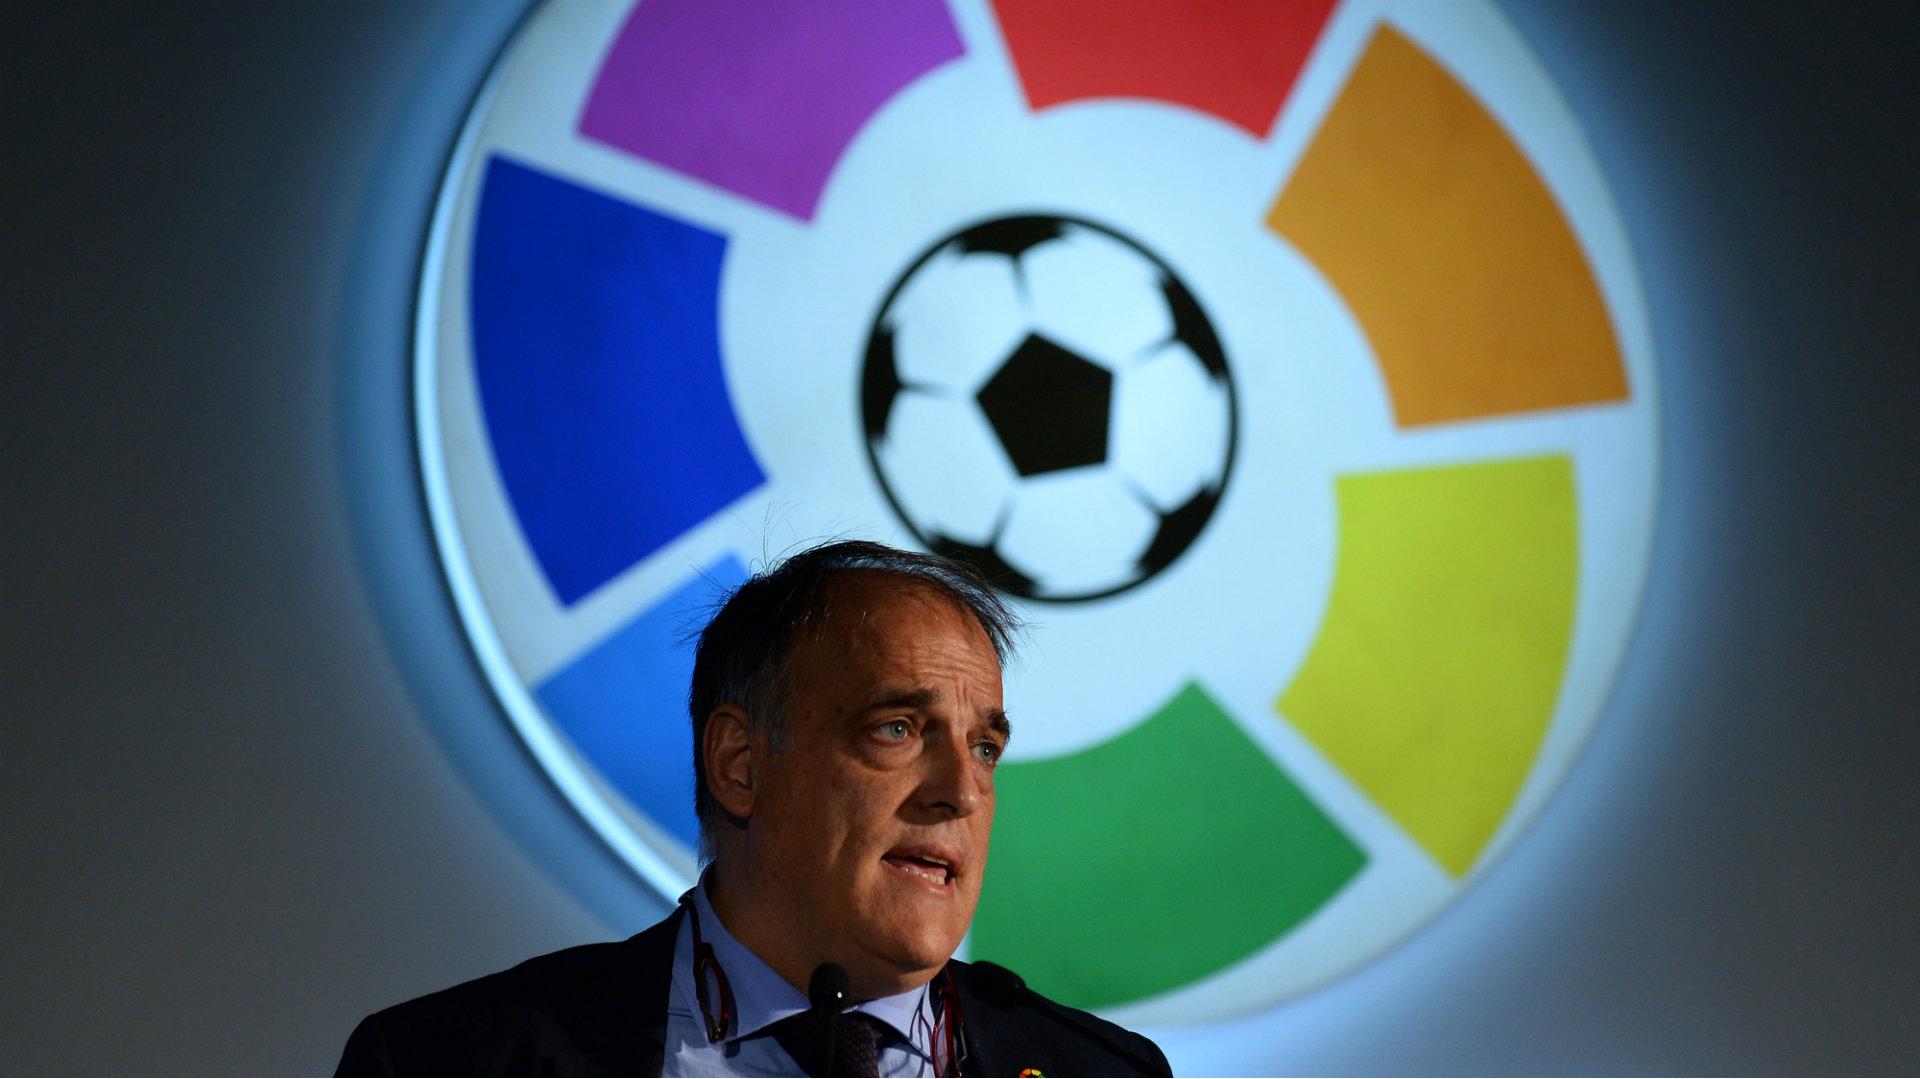 'Football no more dangerous than factory work or fishing' - La Liga president critical of Ligue 1's decision to end season